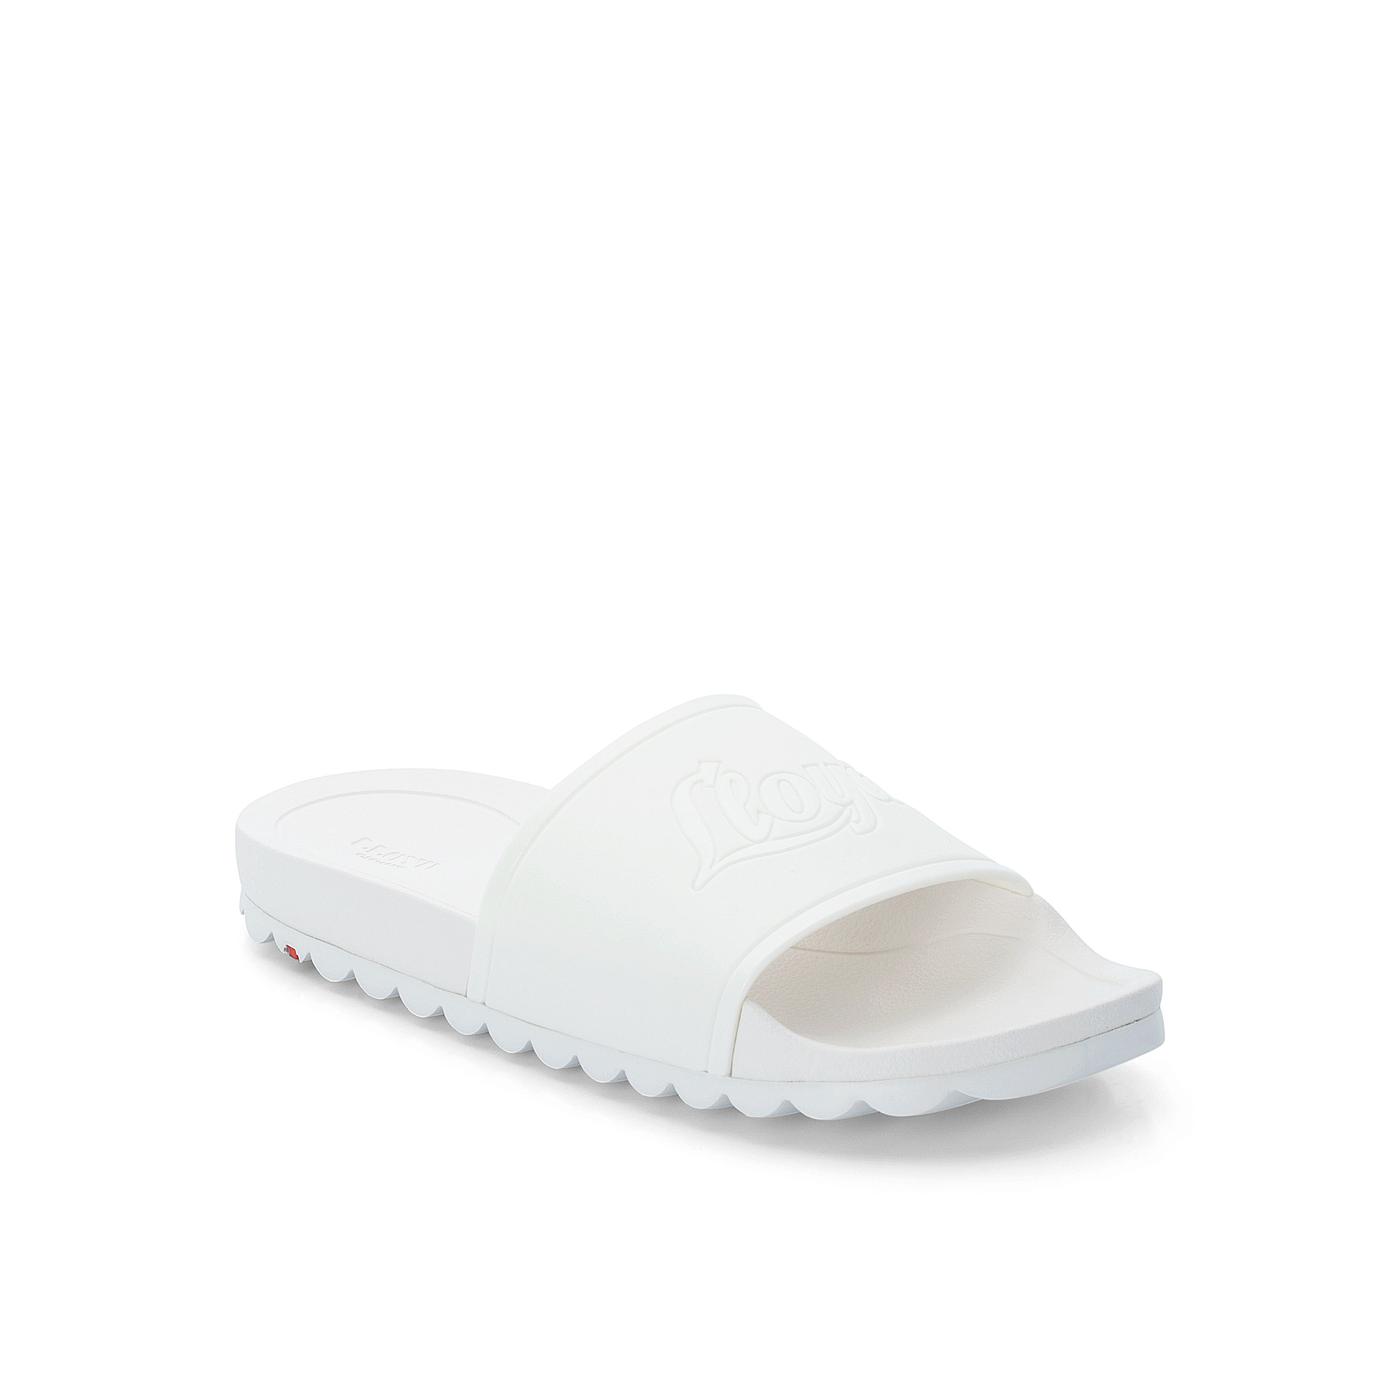 BEACH SANDALE | Schuhe > Sandalen & Zehentrenner | Lloyd